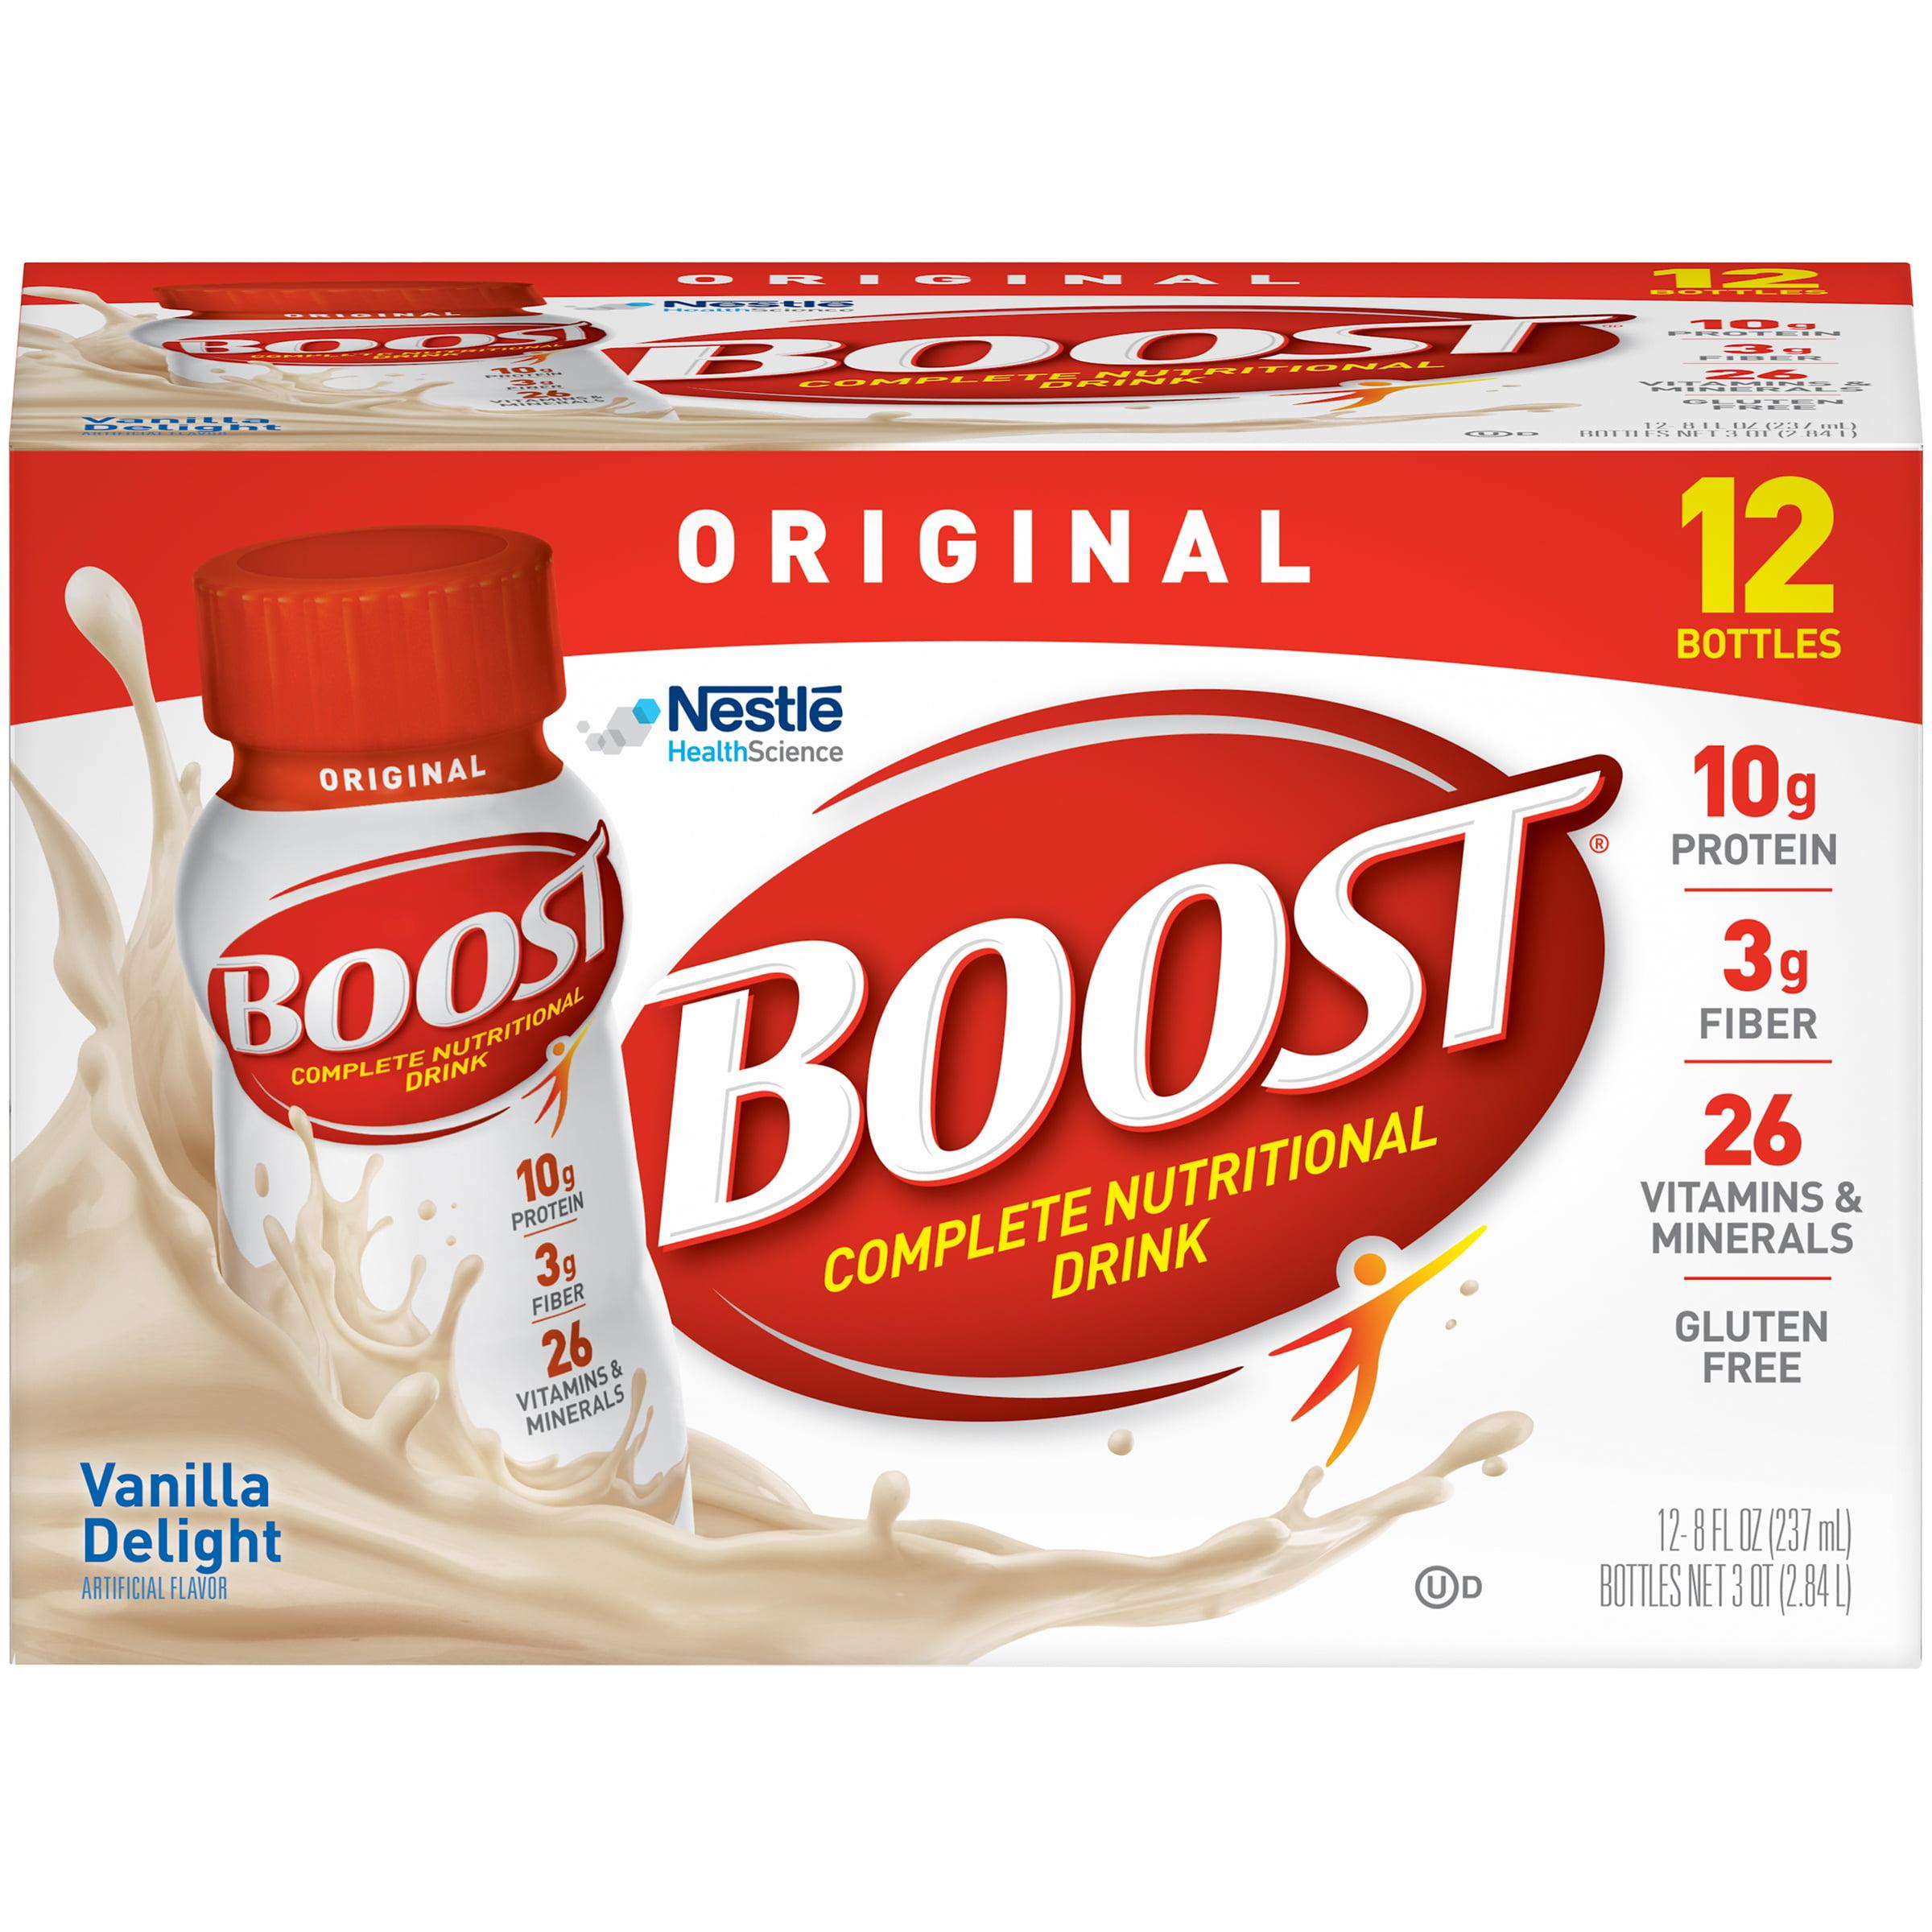 Boost Original Complete Nutritional Drink, Vanilla Delight, 8 Fl oz, 12 Ct